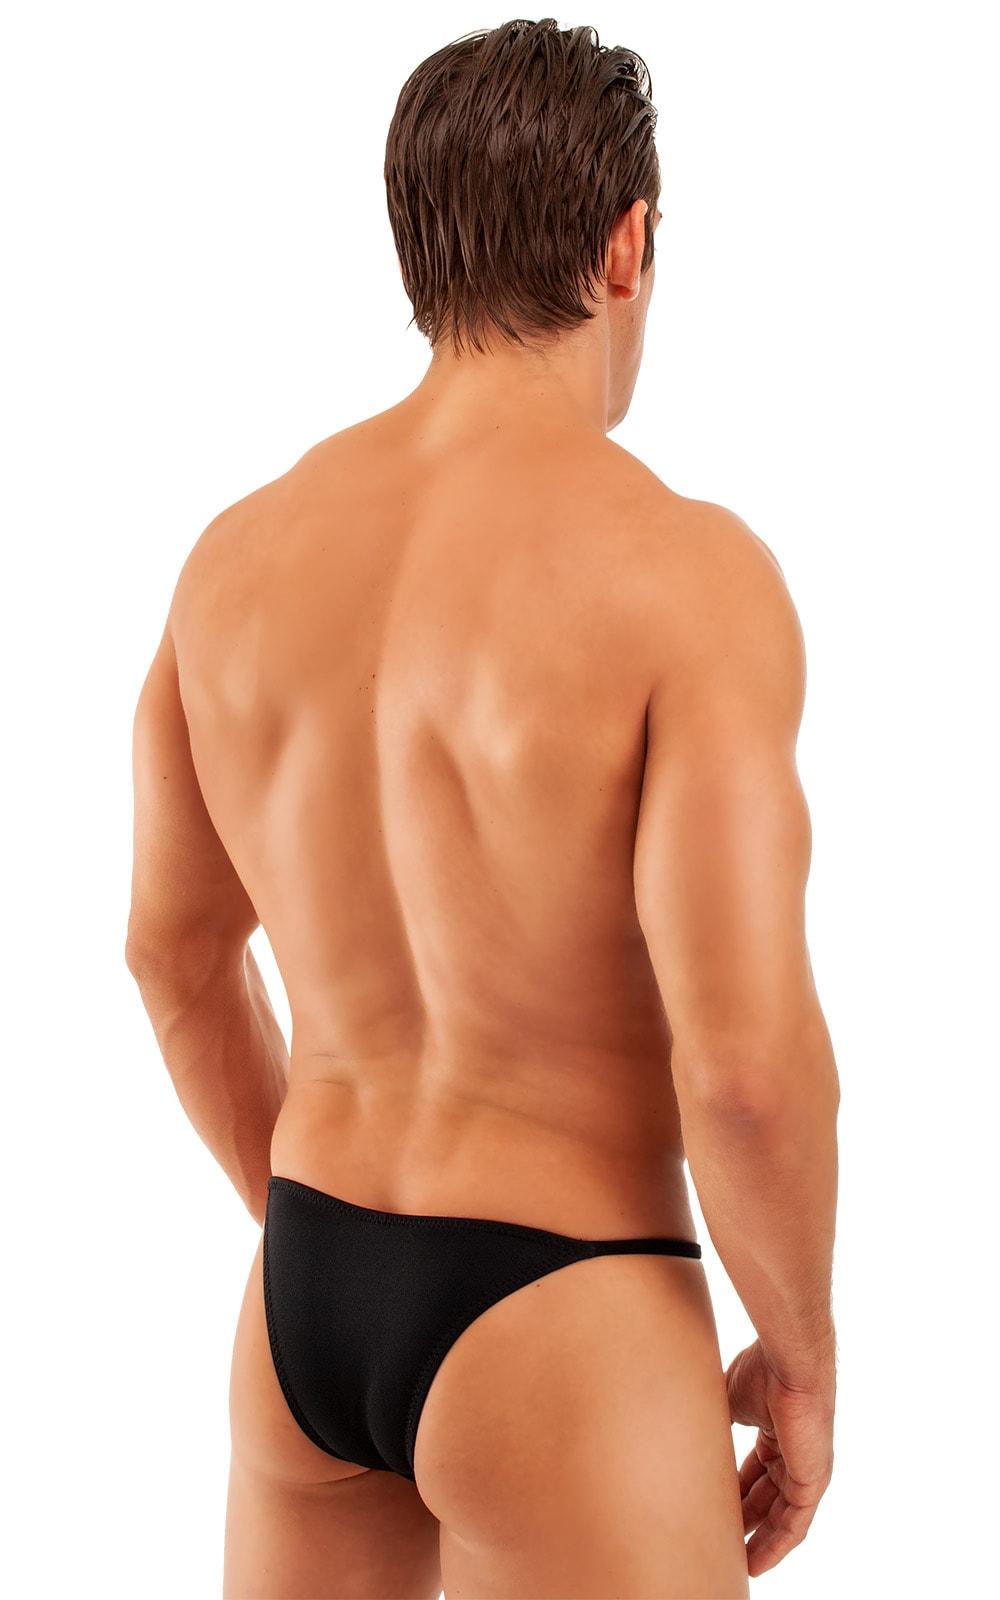 Super Low Brazilian Bikini in Black 3